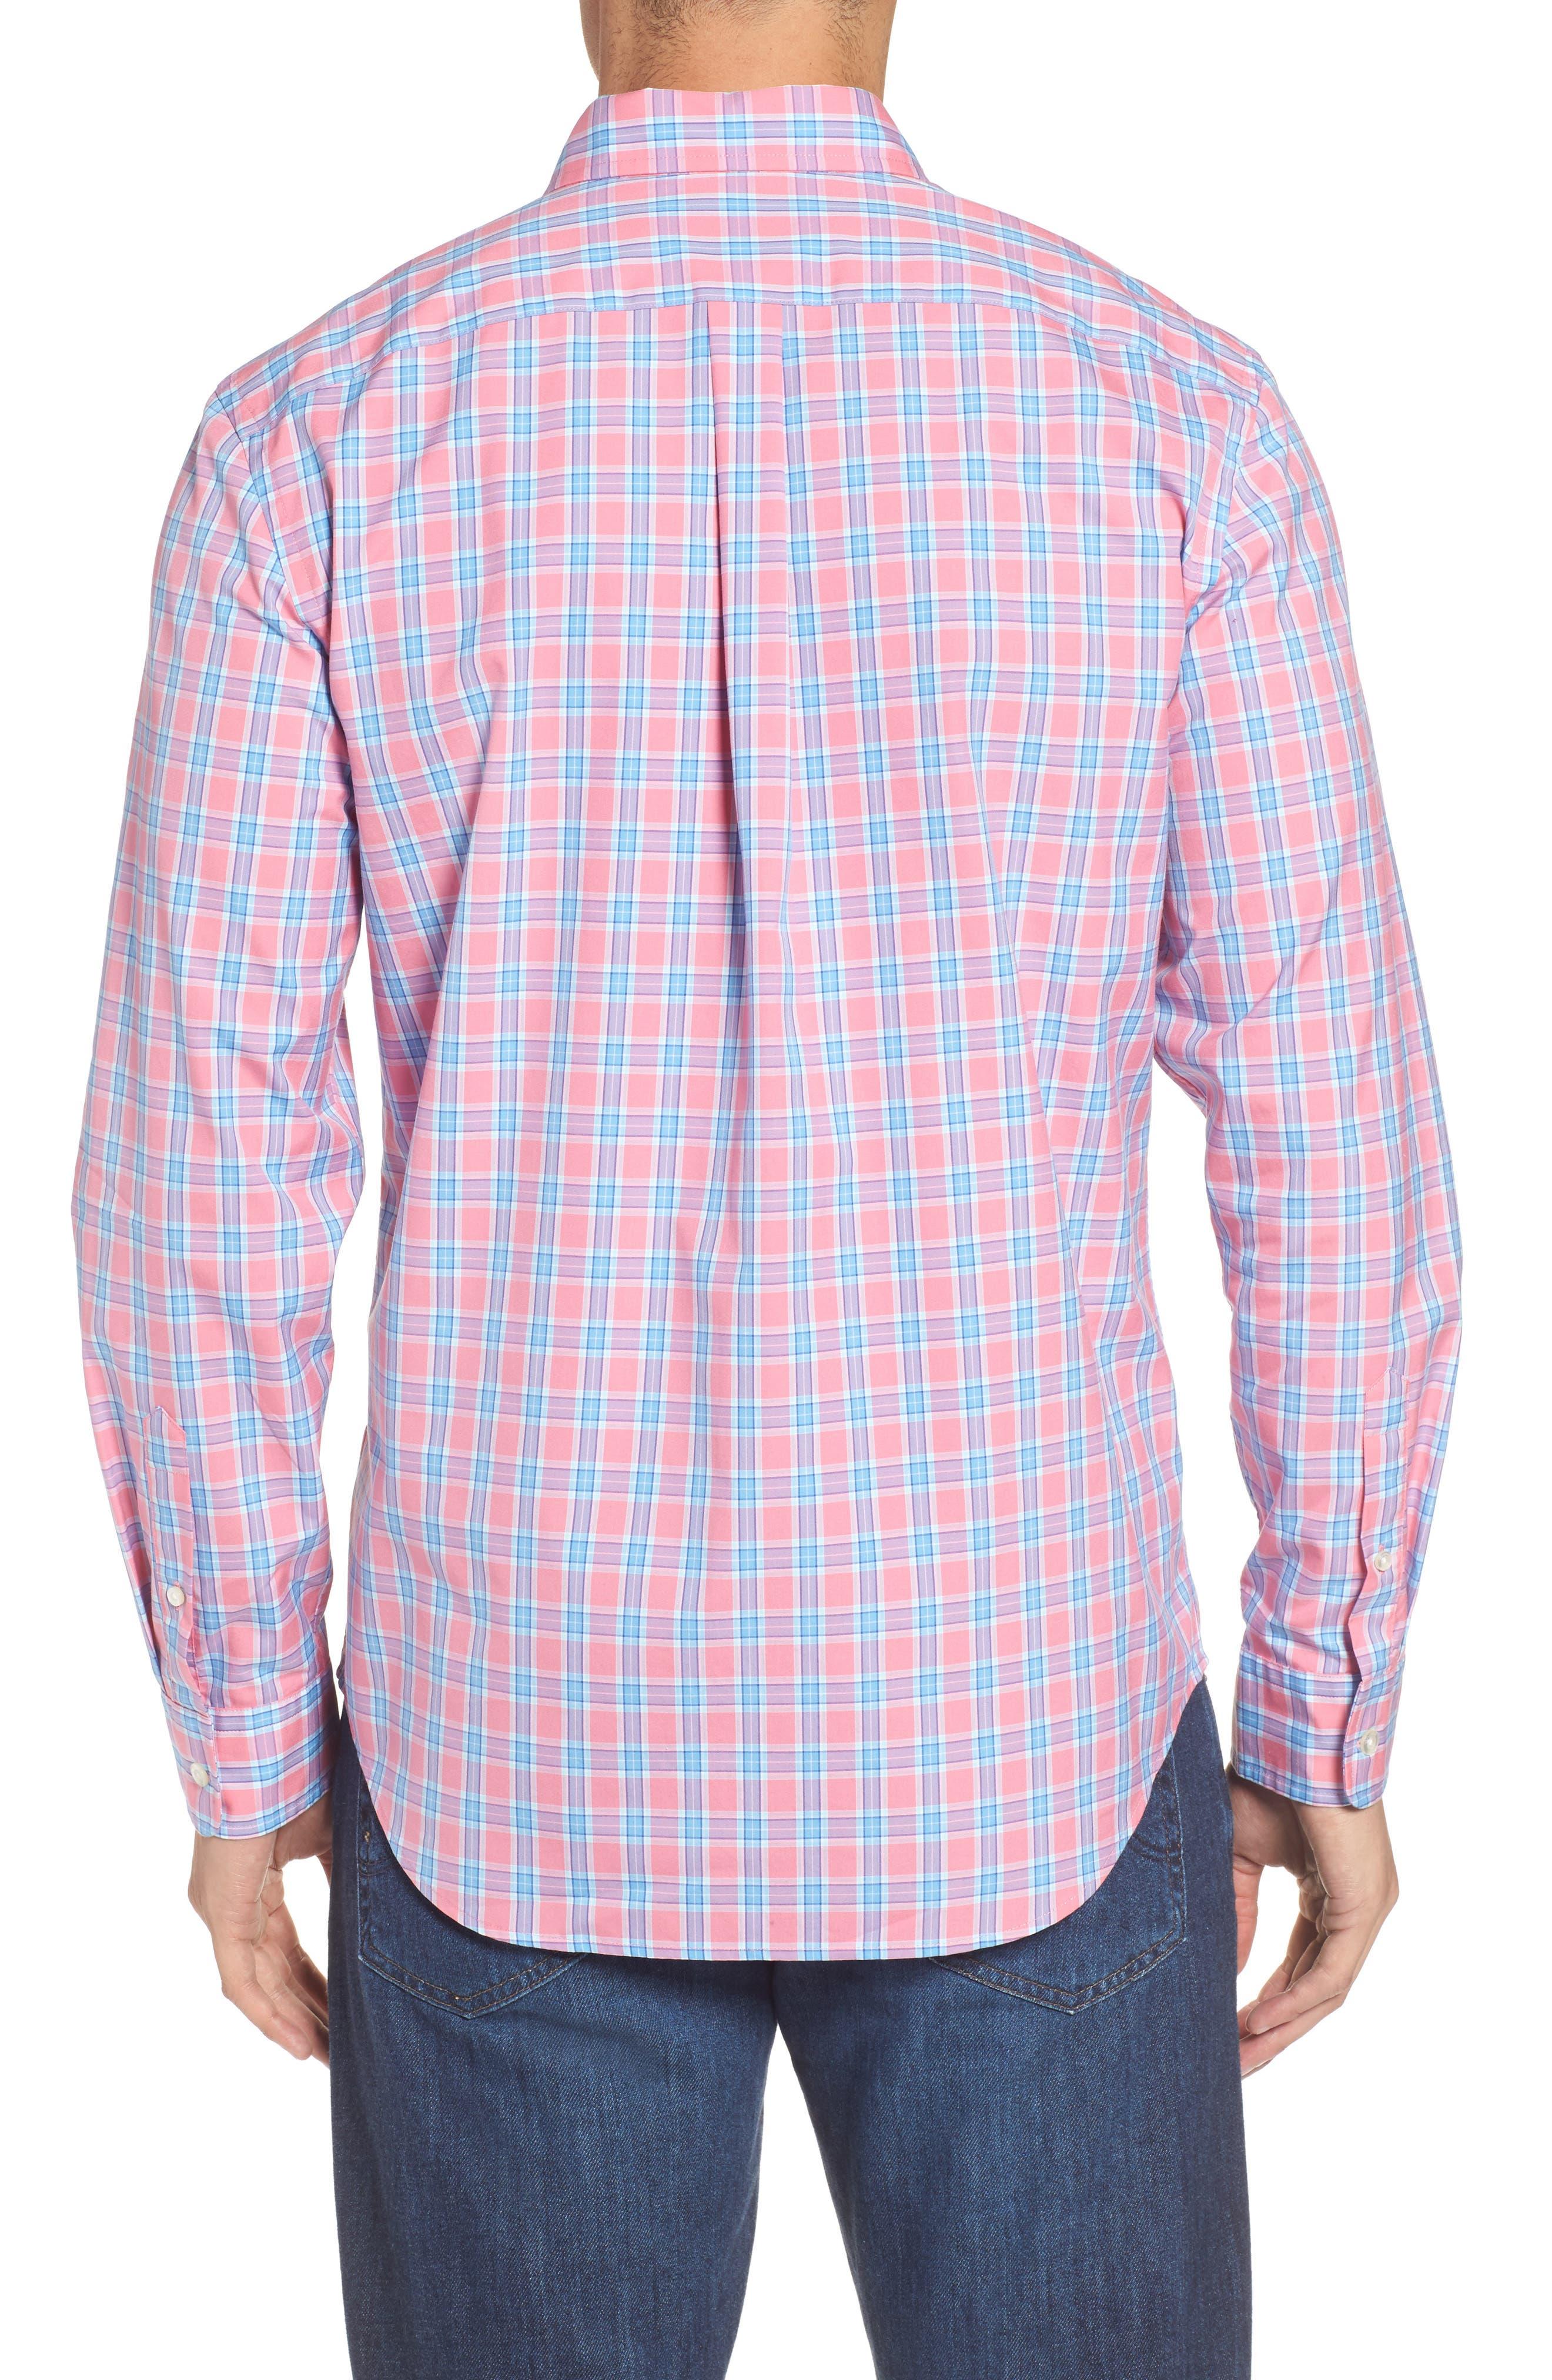 Alternate Image 2  - vineyard vines Tucker Bayard Classic Fit Plaid Sport Shirt